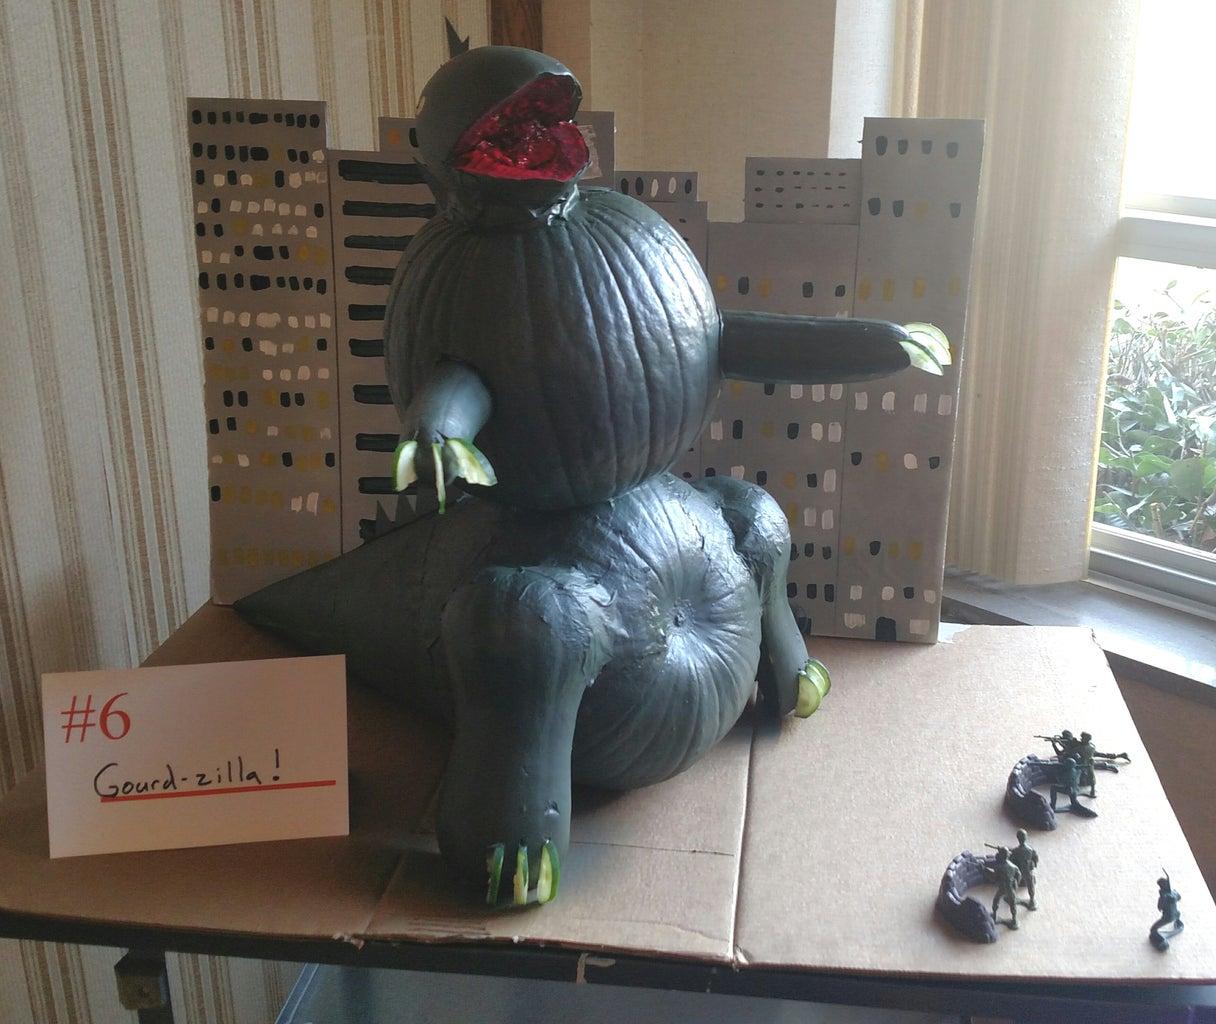 GOURDZILLA! - Godzilla Pumpkin